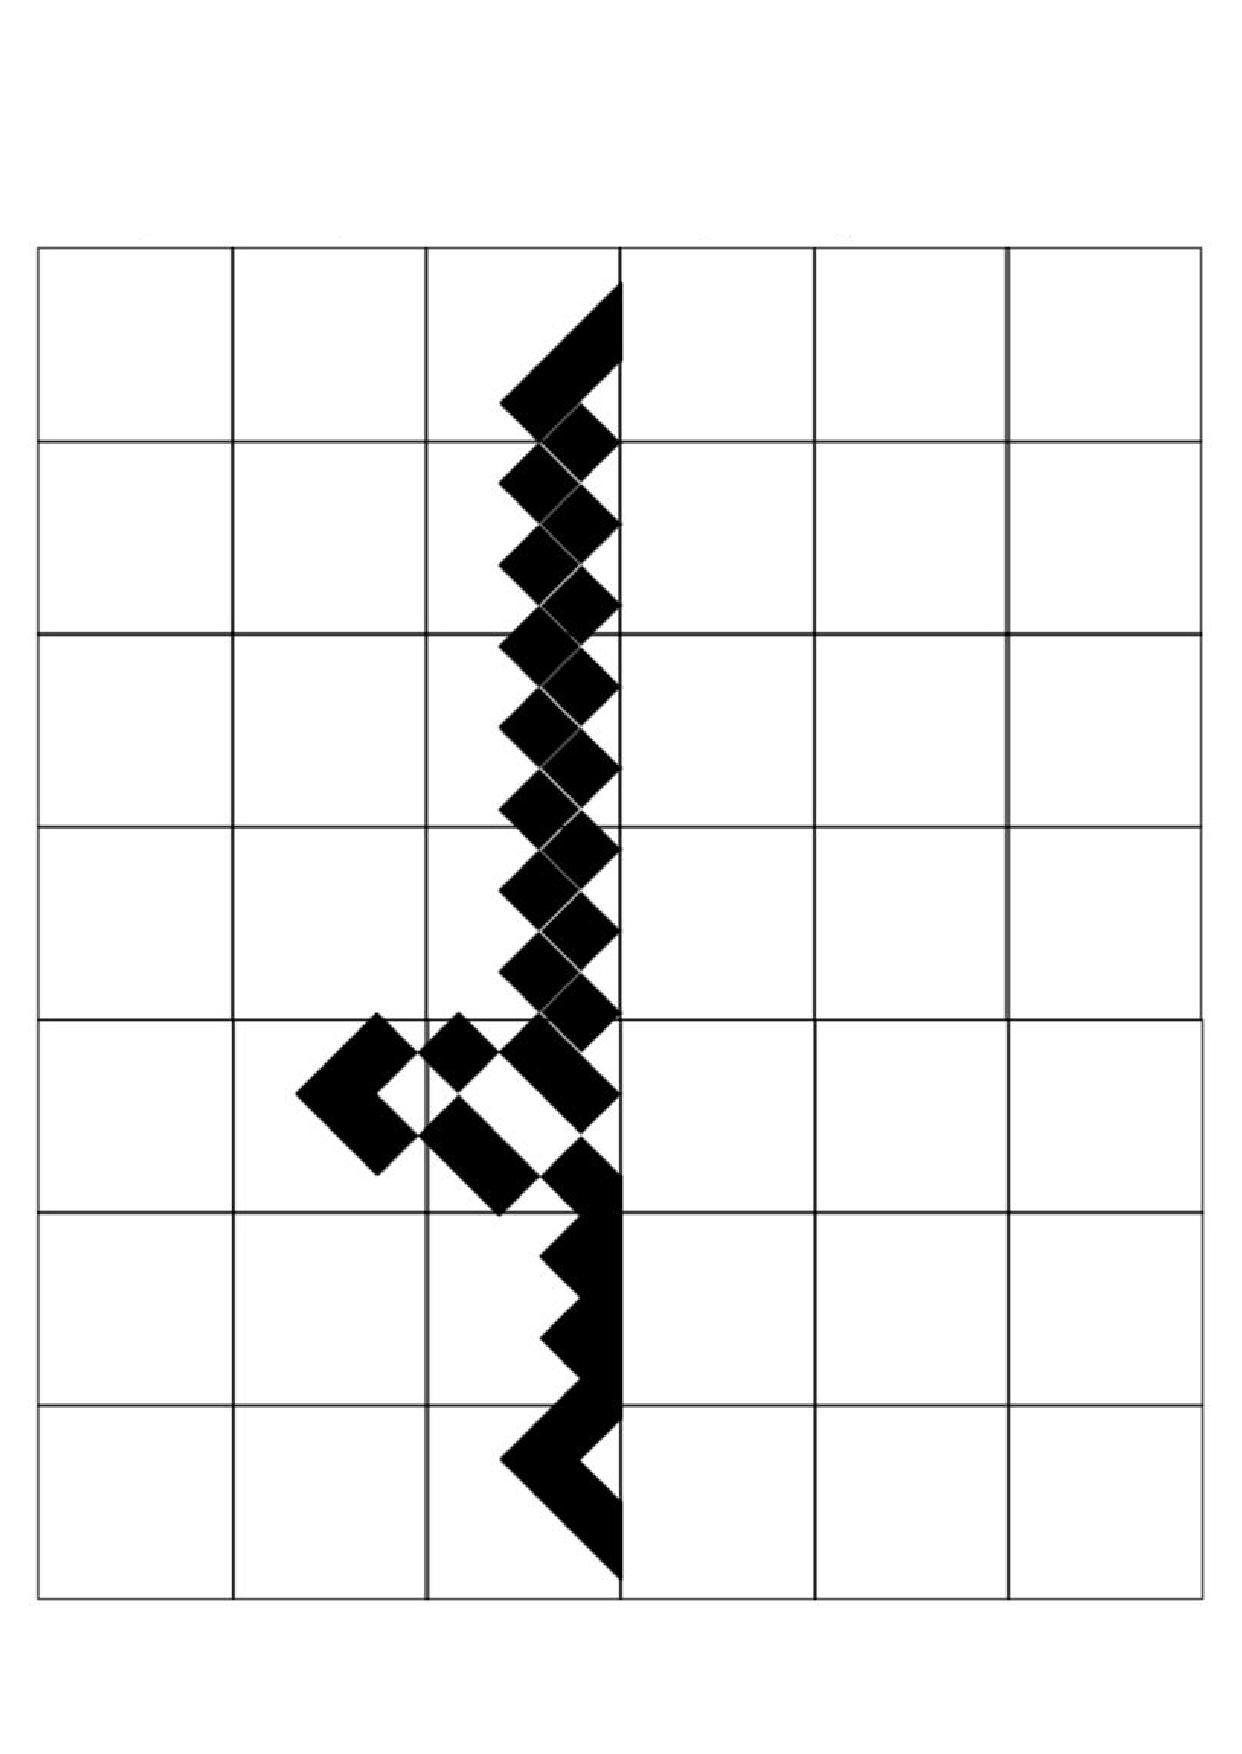 Symmetry Hard Funnycrafts